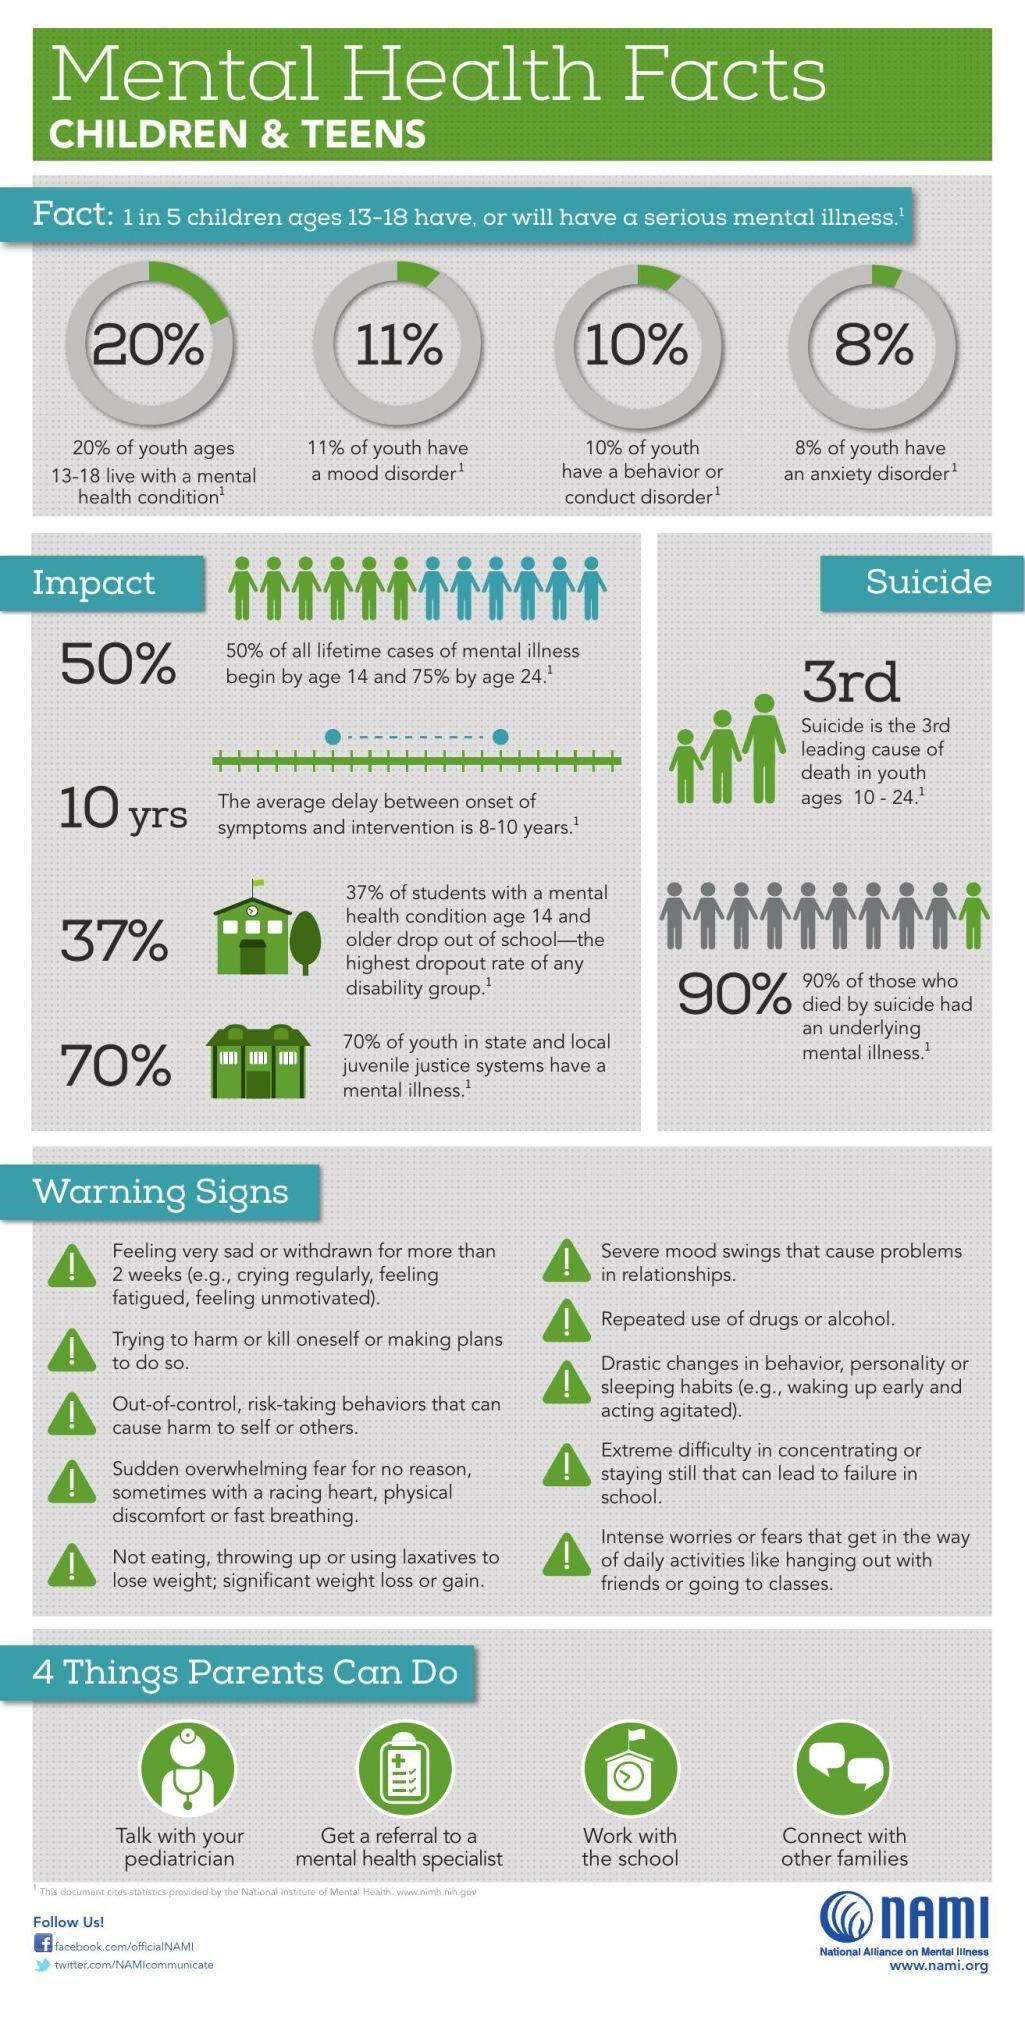 Children-MH-Facts-NAMI.pdf